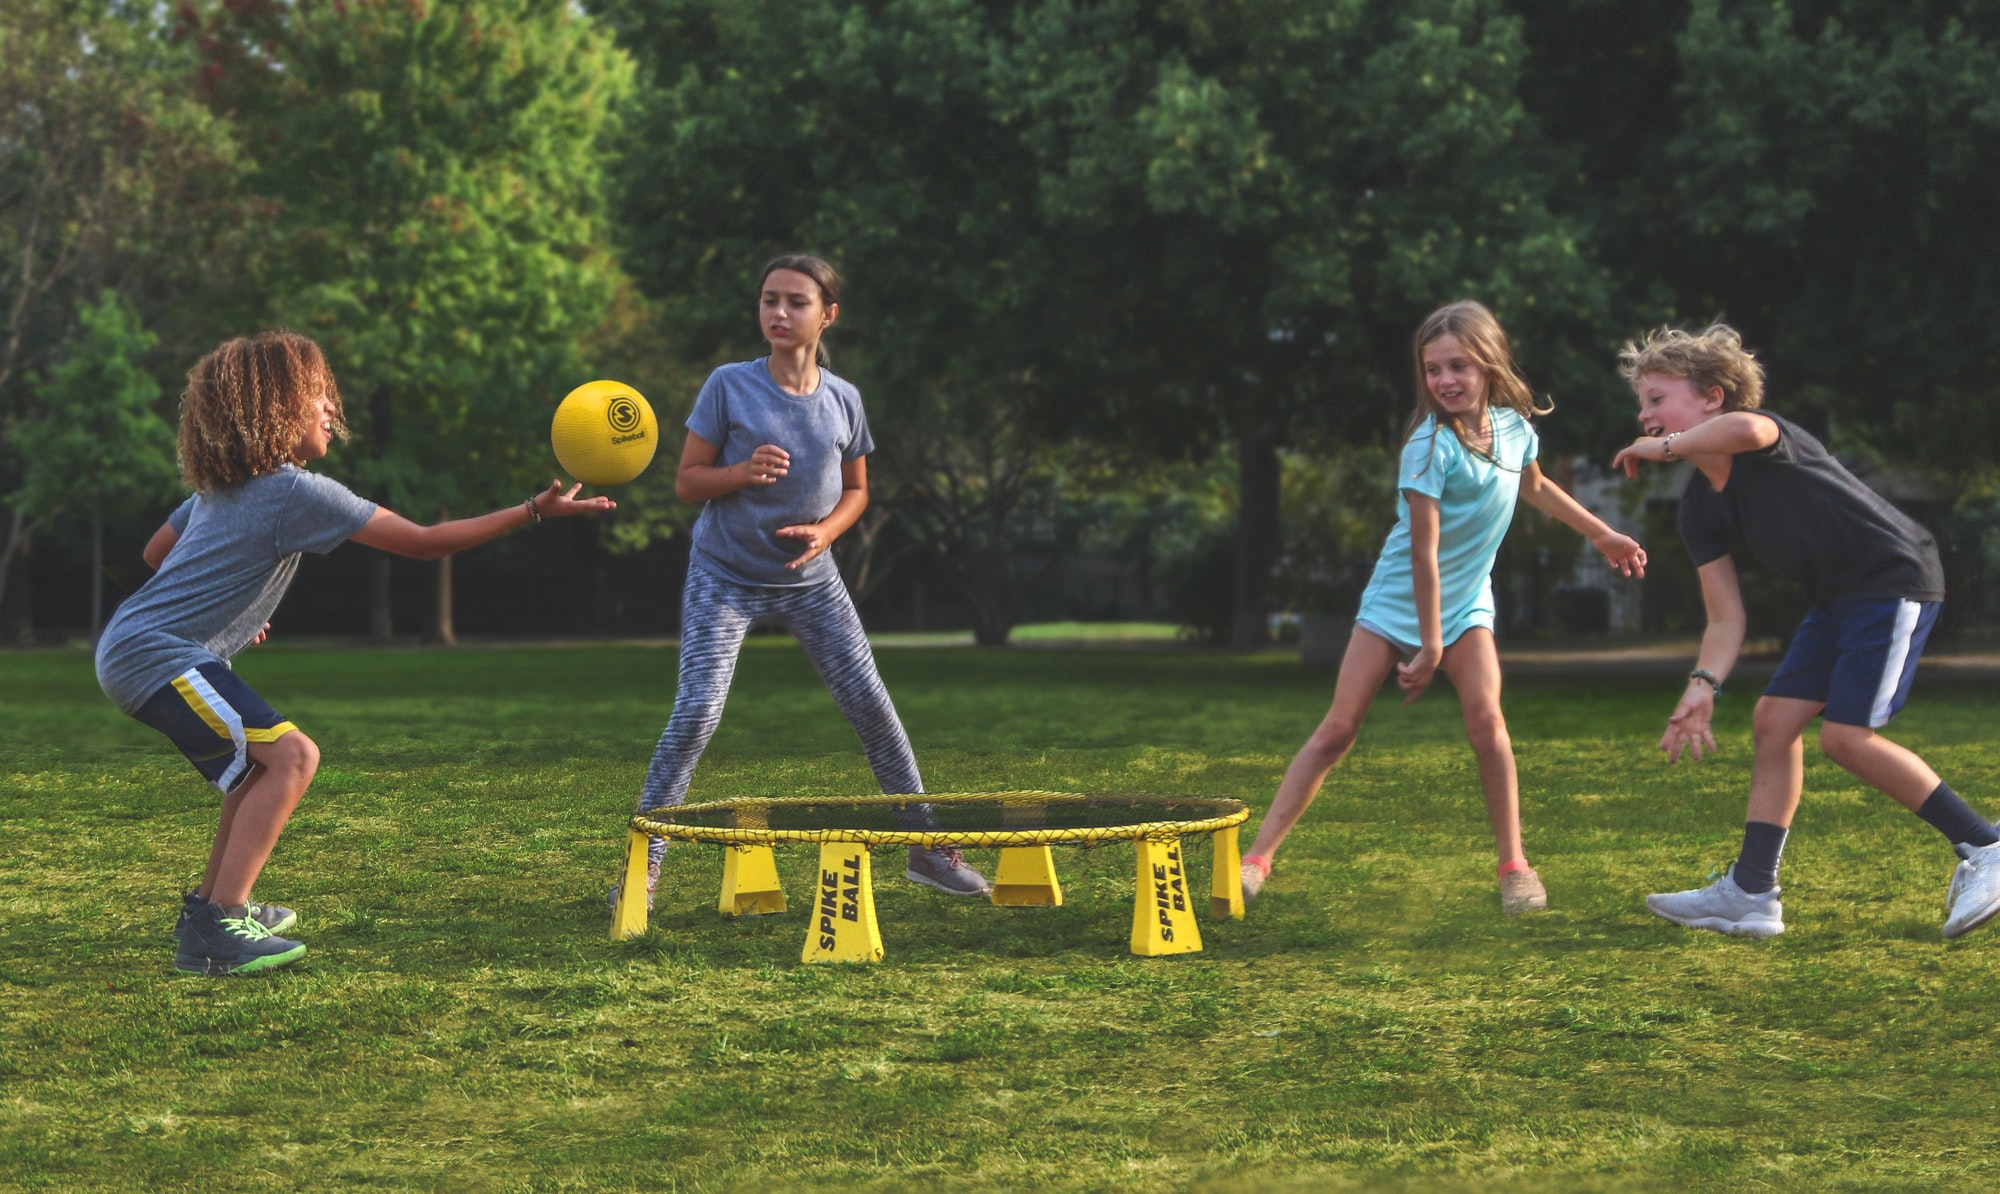 Kids playing Spikeball on the Spikeball Rookie Kit